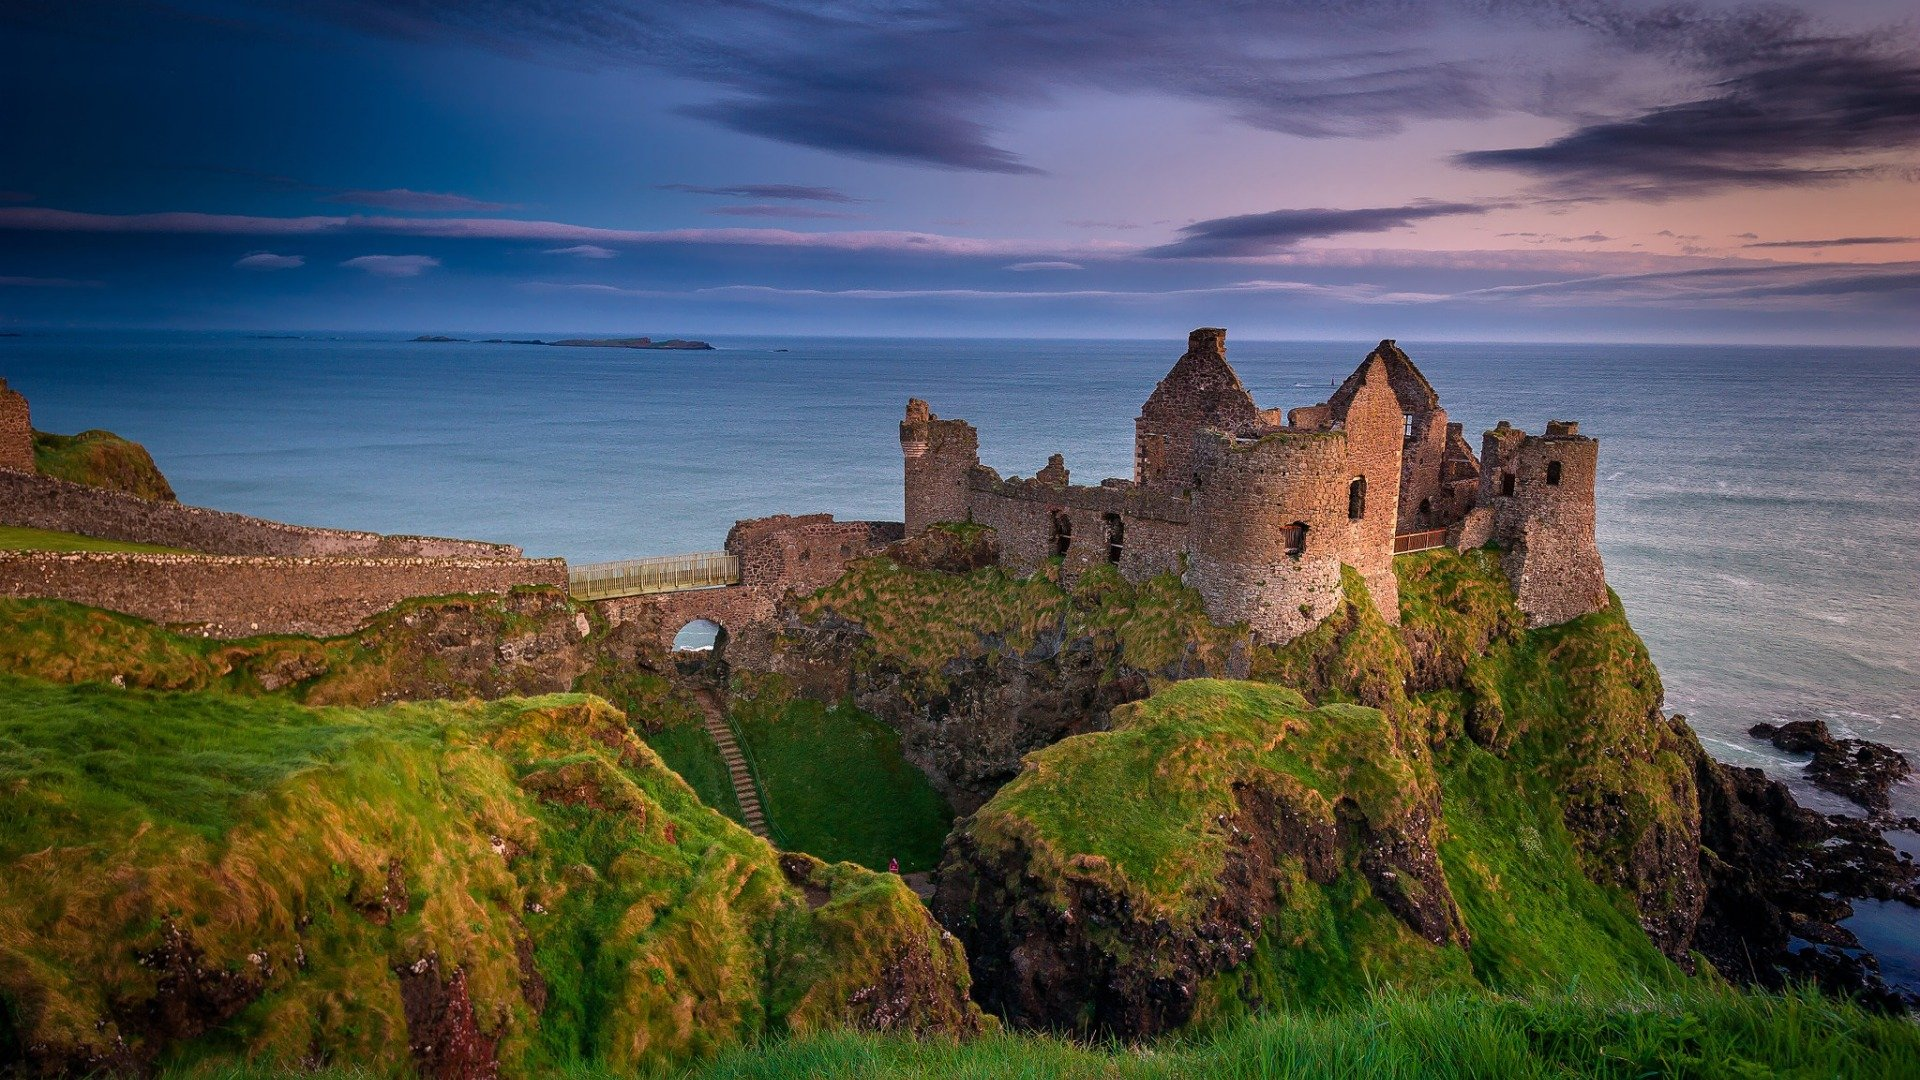 Northern Ireland County Antrim castle Danlos wallpaper 1920x1080